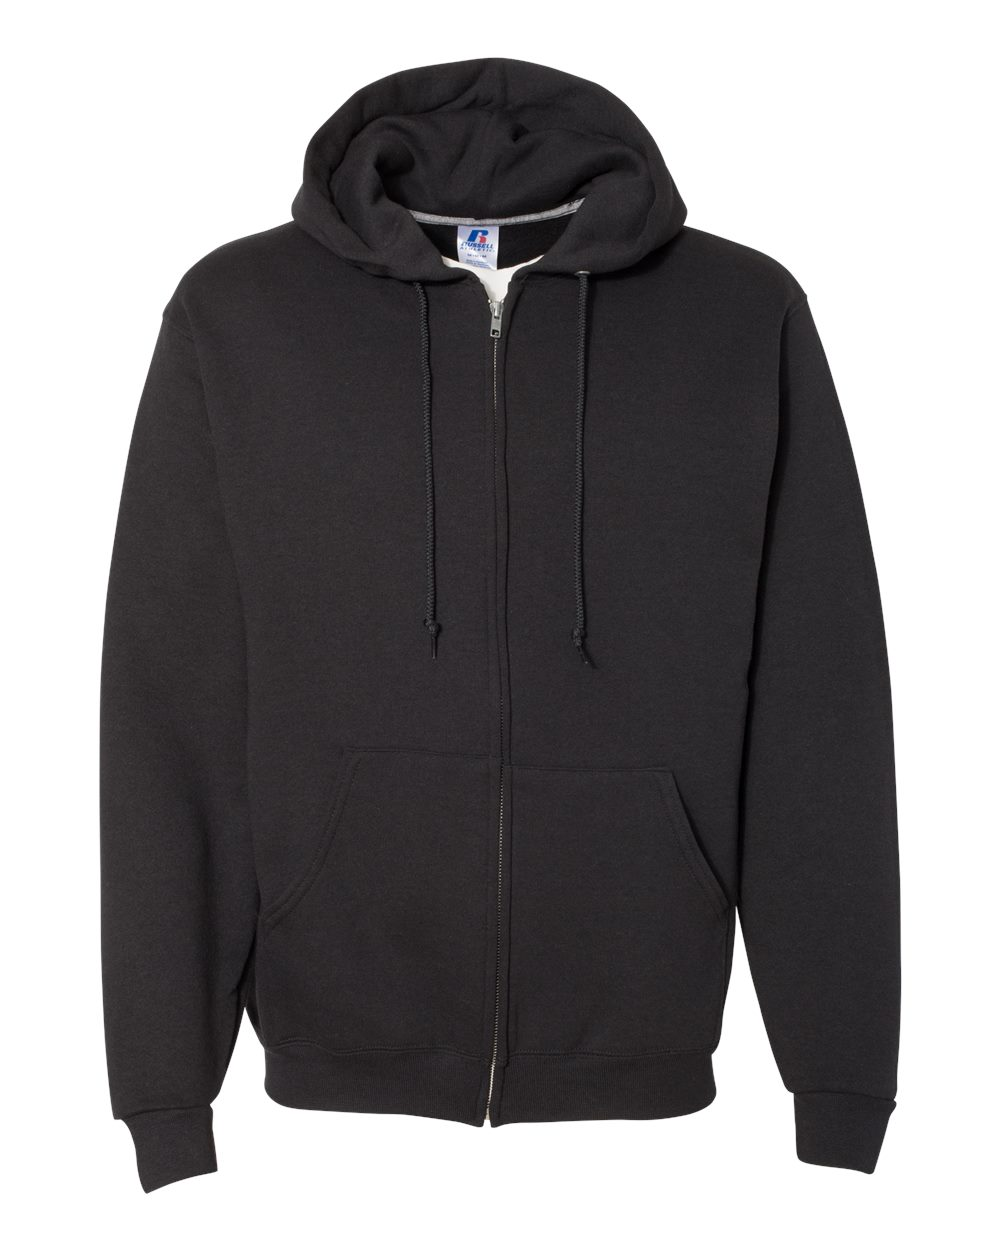 Russell-Athletic-Blank-Plain-Hooded-Full-Zip-Sweatshirt-697HBM-up-to-3XL thumbnail 6